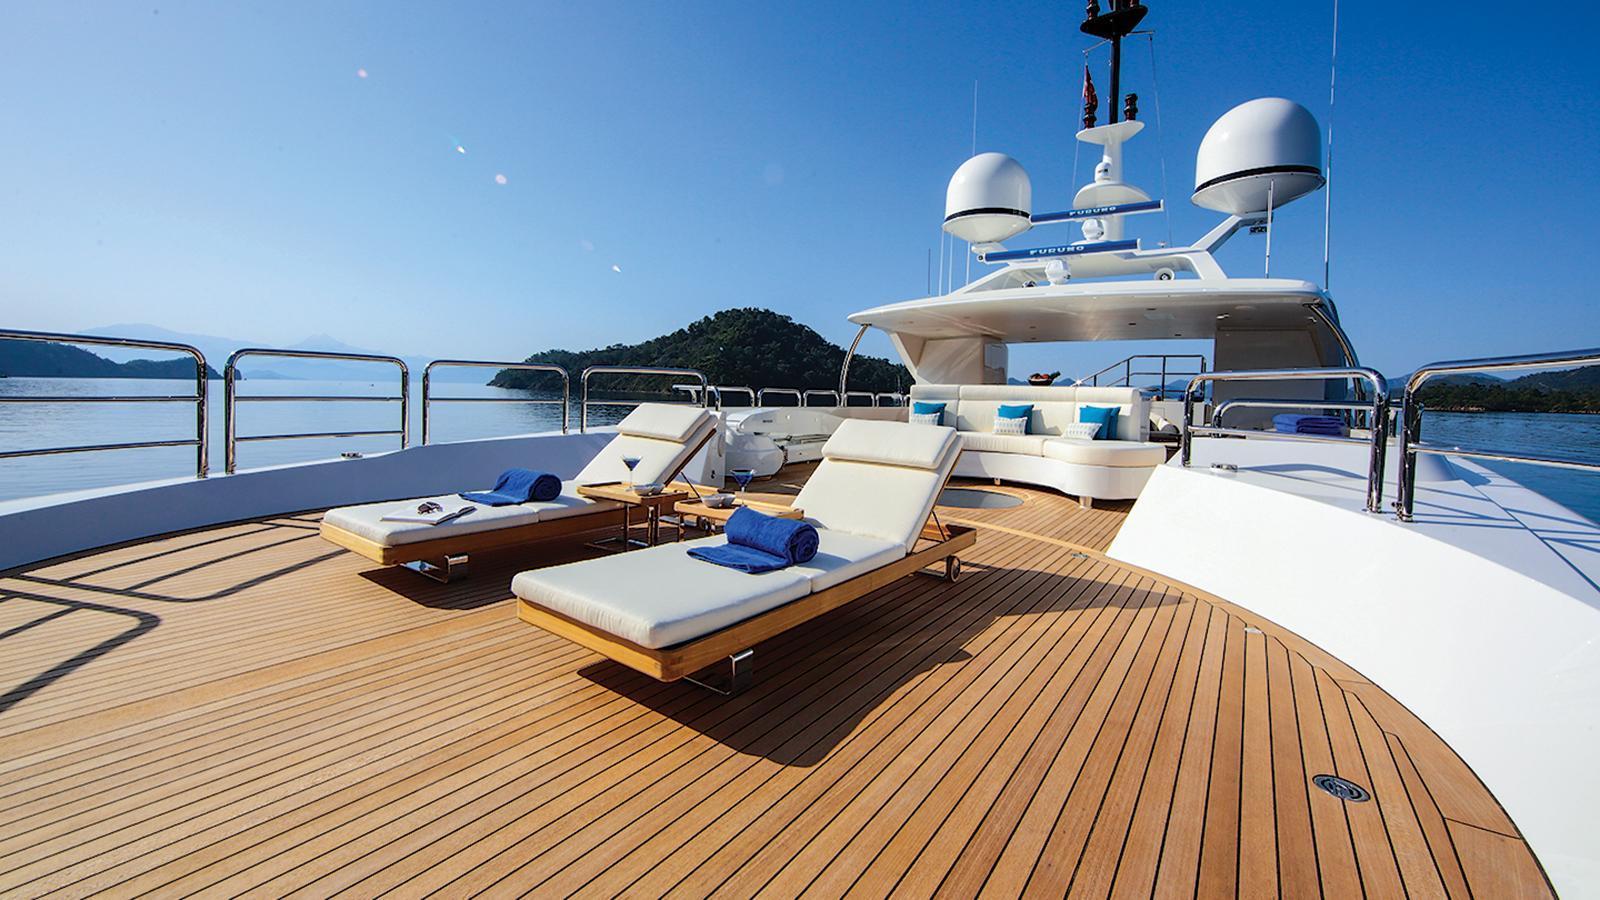 vica-motor-yacht-benetti-2015-50m-sun-deck